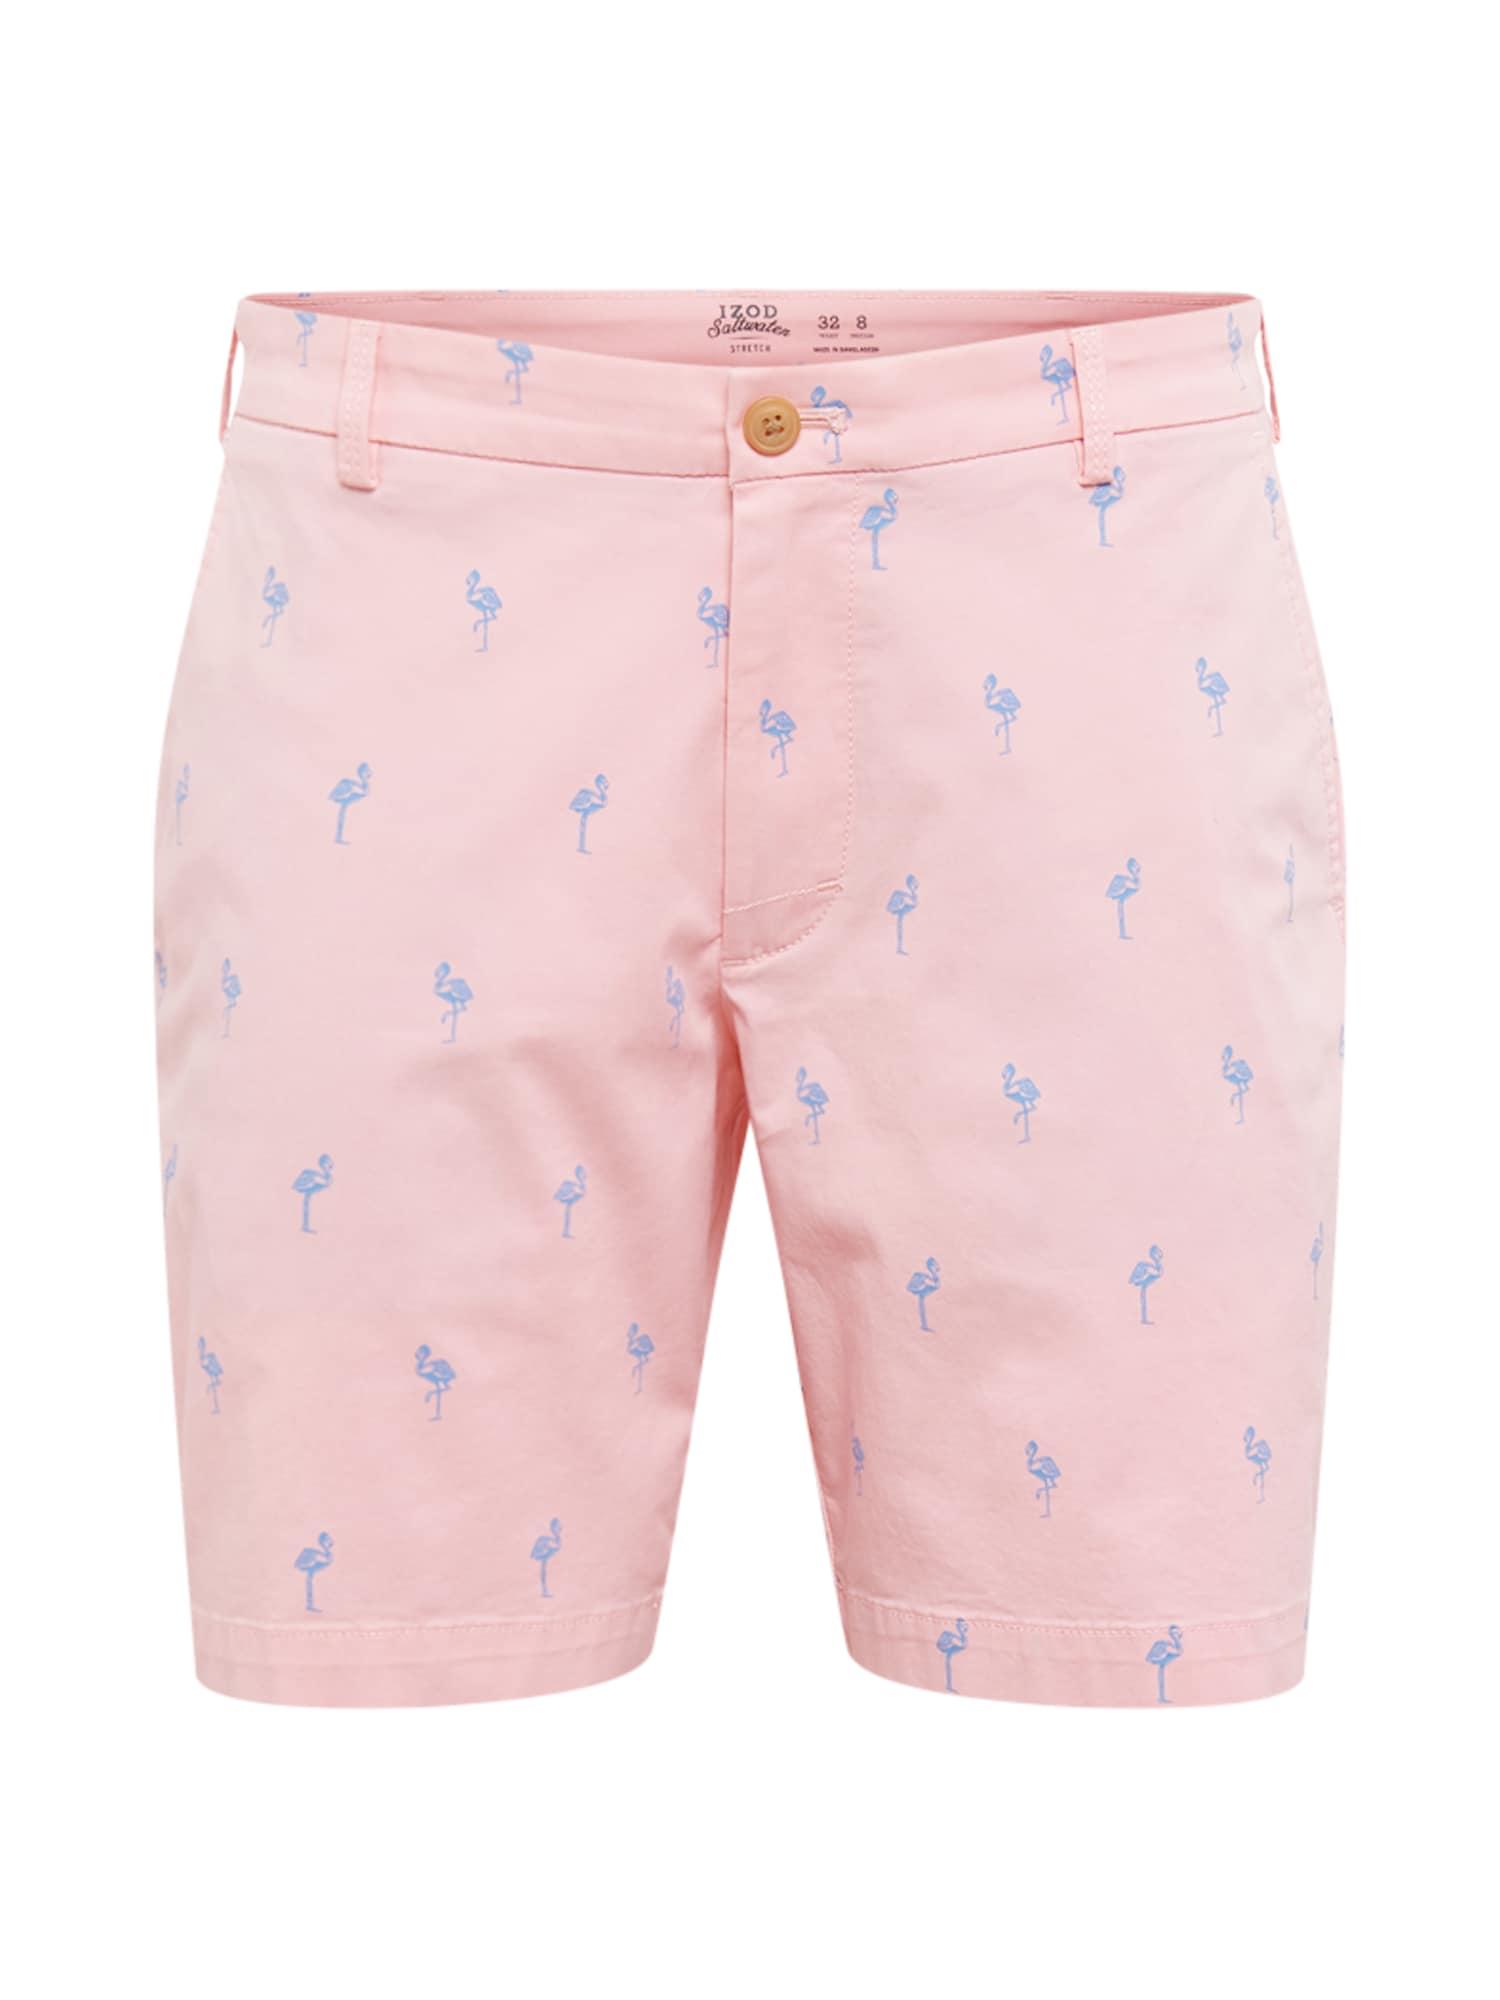 Kalhoty SALTWATER BEACHTOWN modrá růžová IZOD